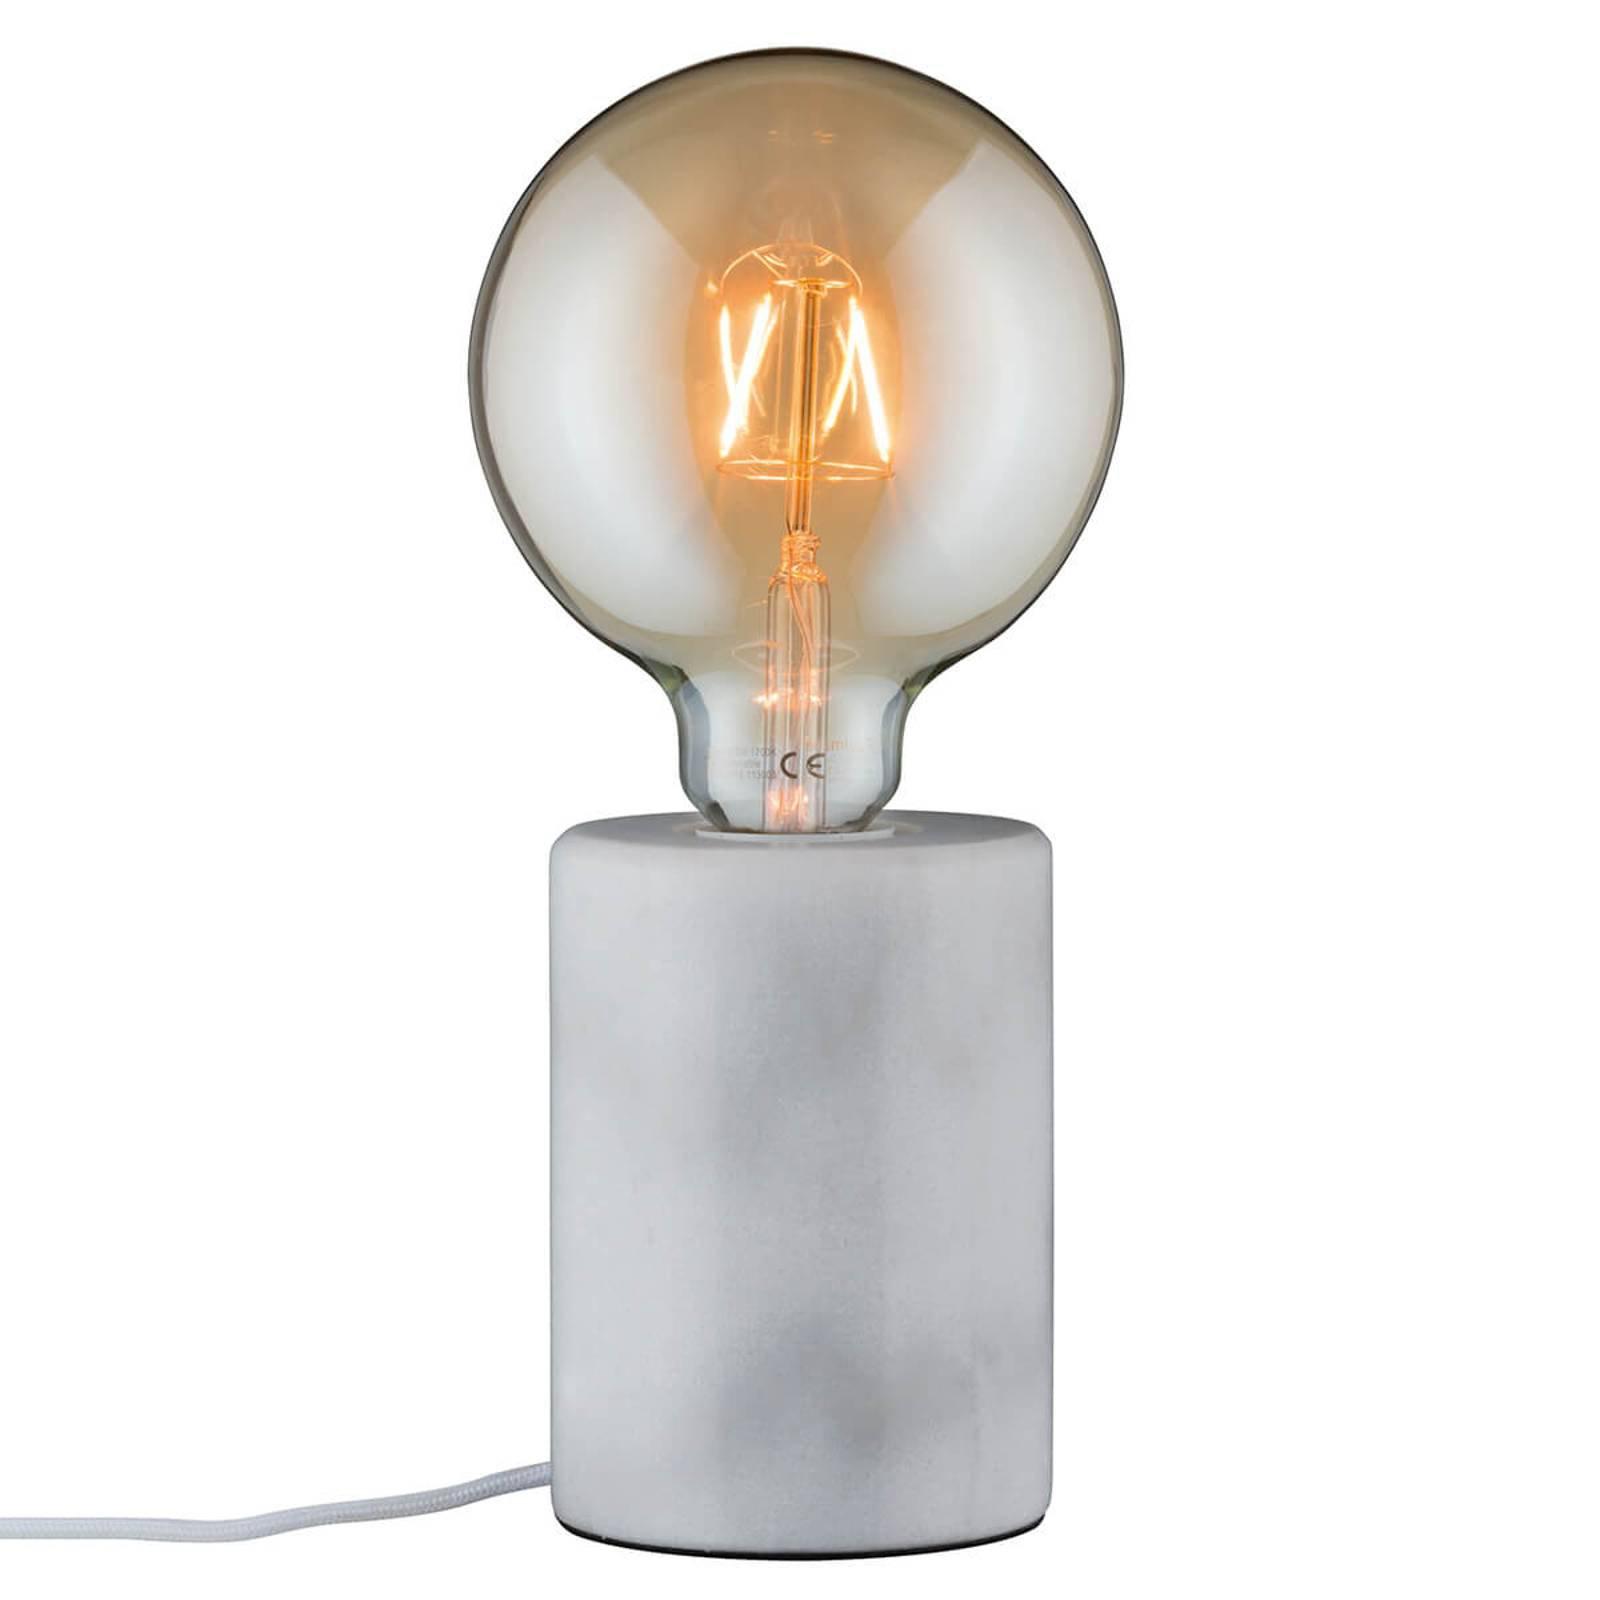 Hvit, puristisk bordlampe i marmor Nordin